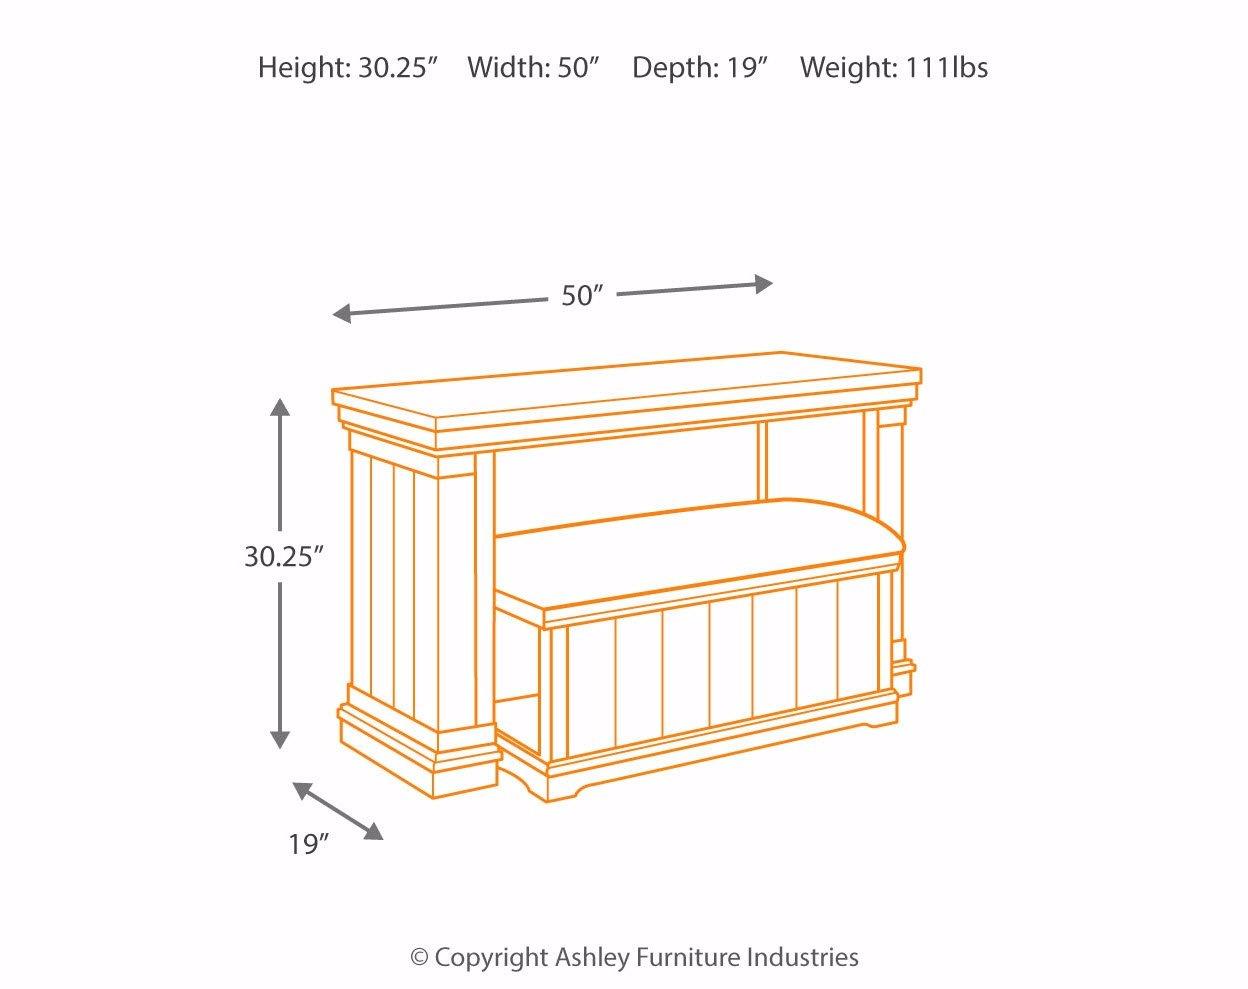 Ashley Furniture Signature Design - Merihill Sofa Console Table with Ottoman - Rectangular - Medium Brown